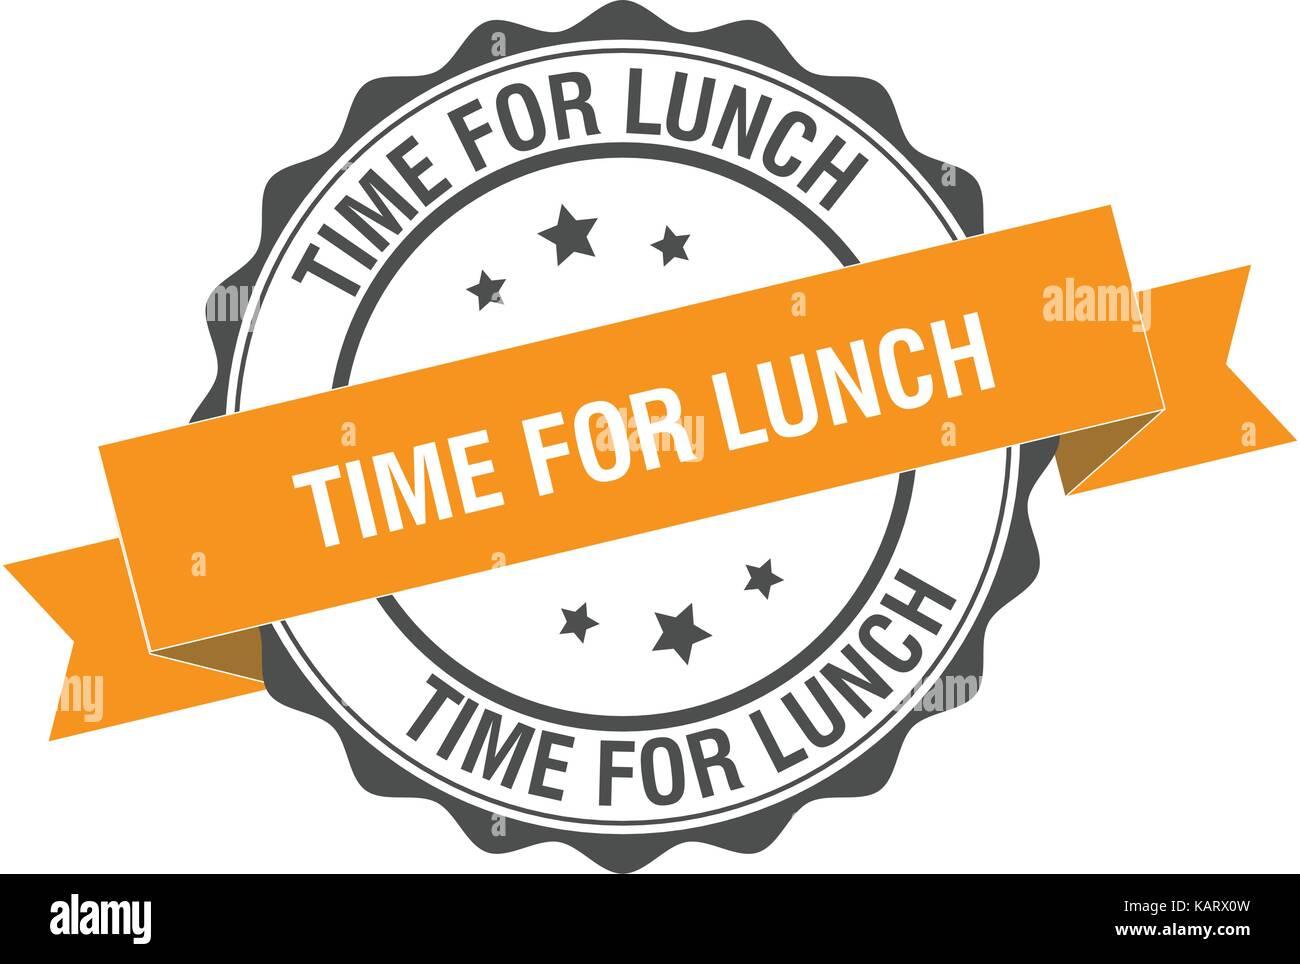 Time For Lunch Stamp Illustration